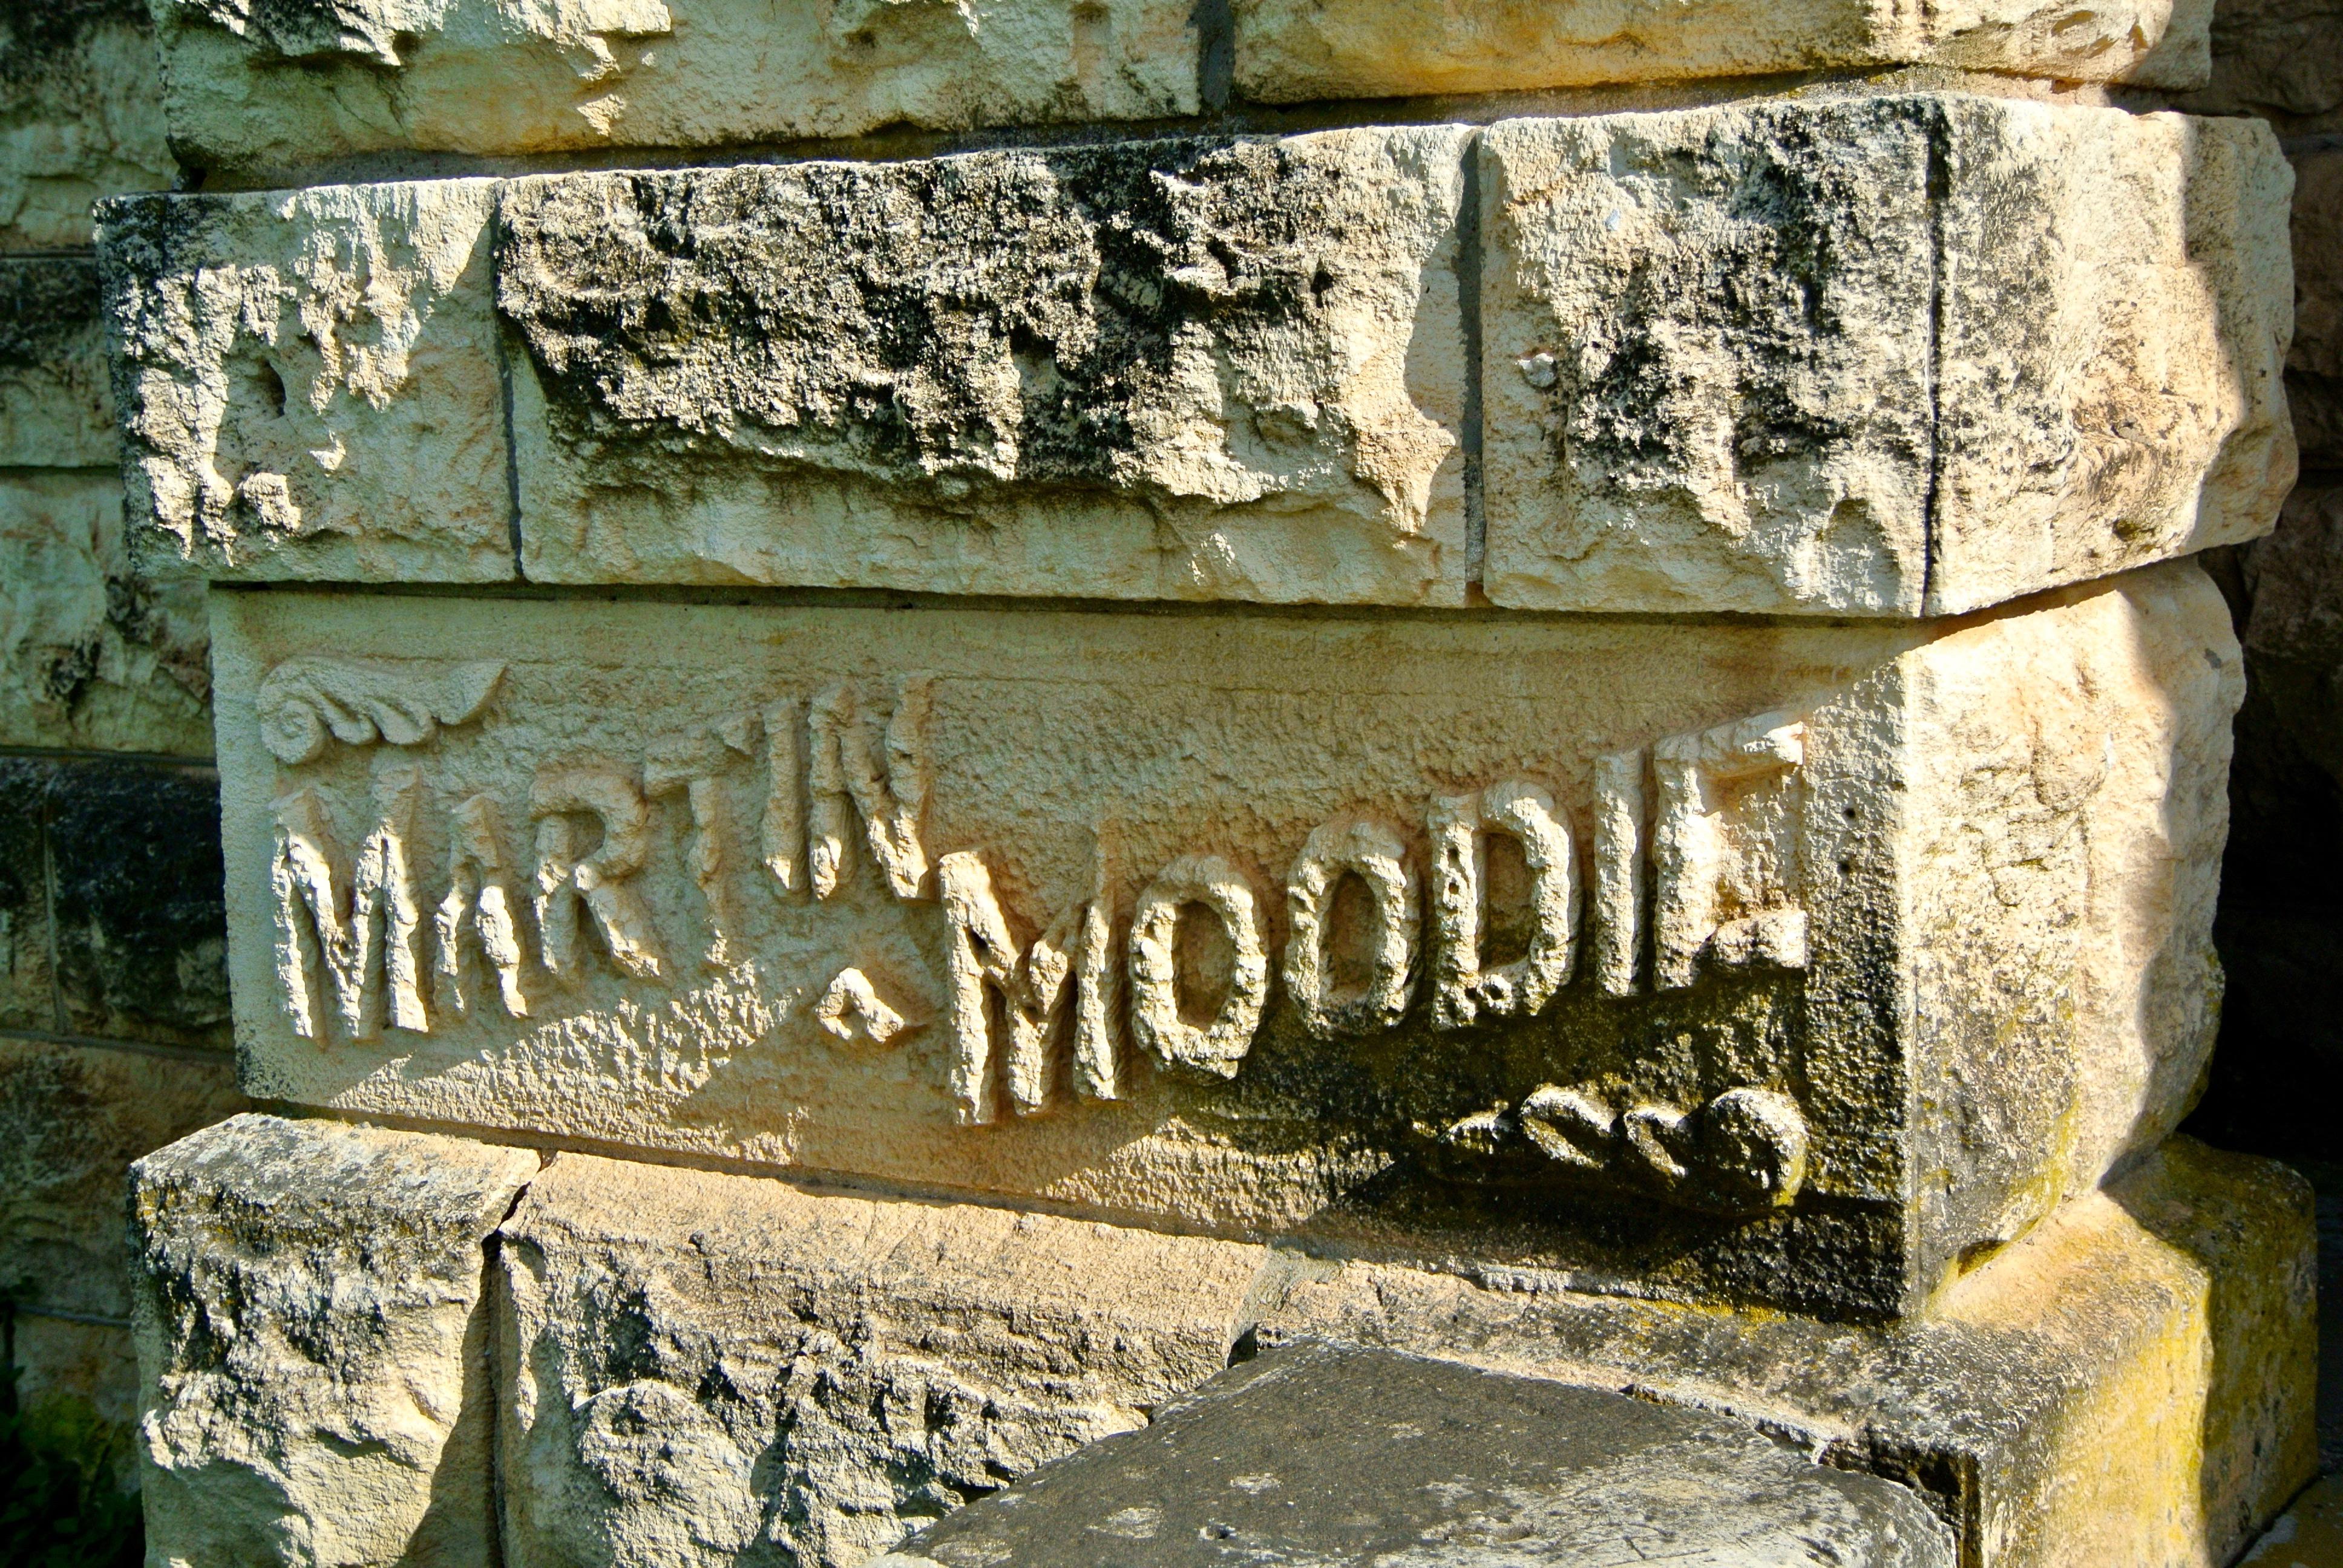 Martin and Moodie Sherwood